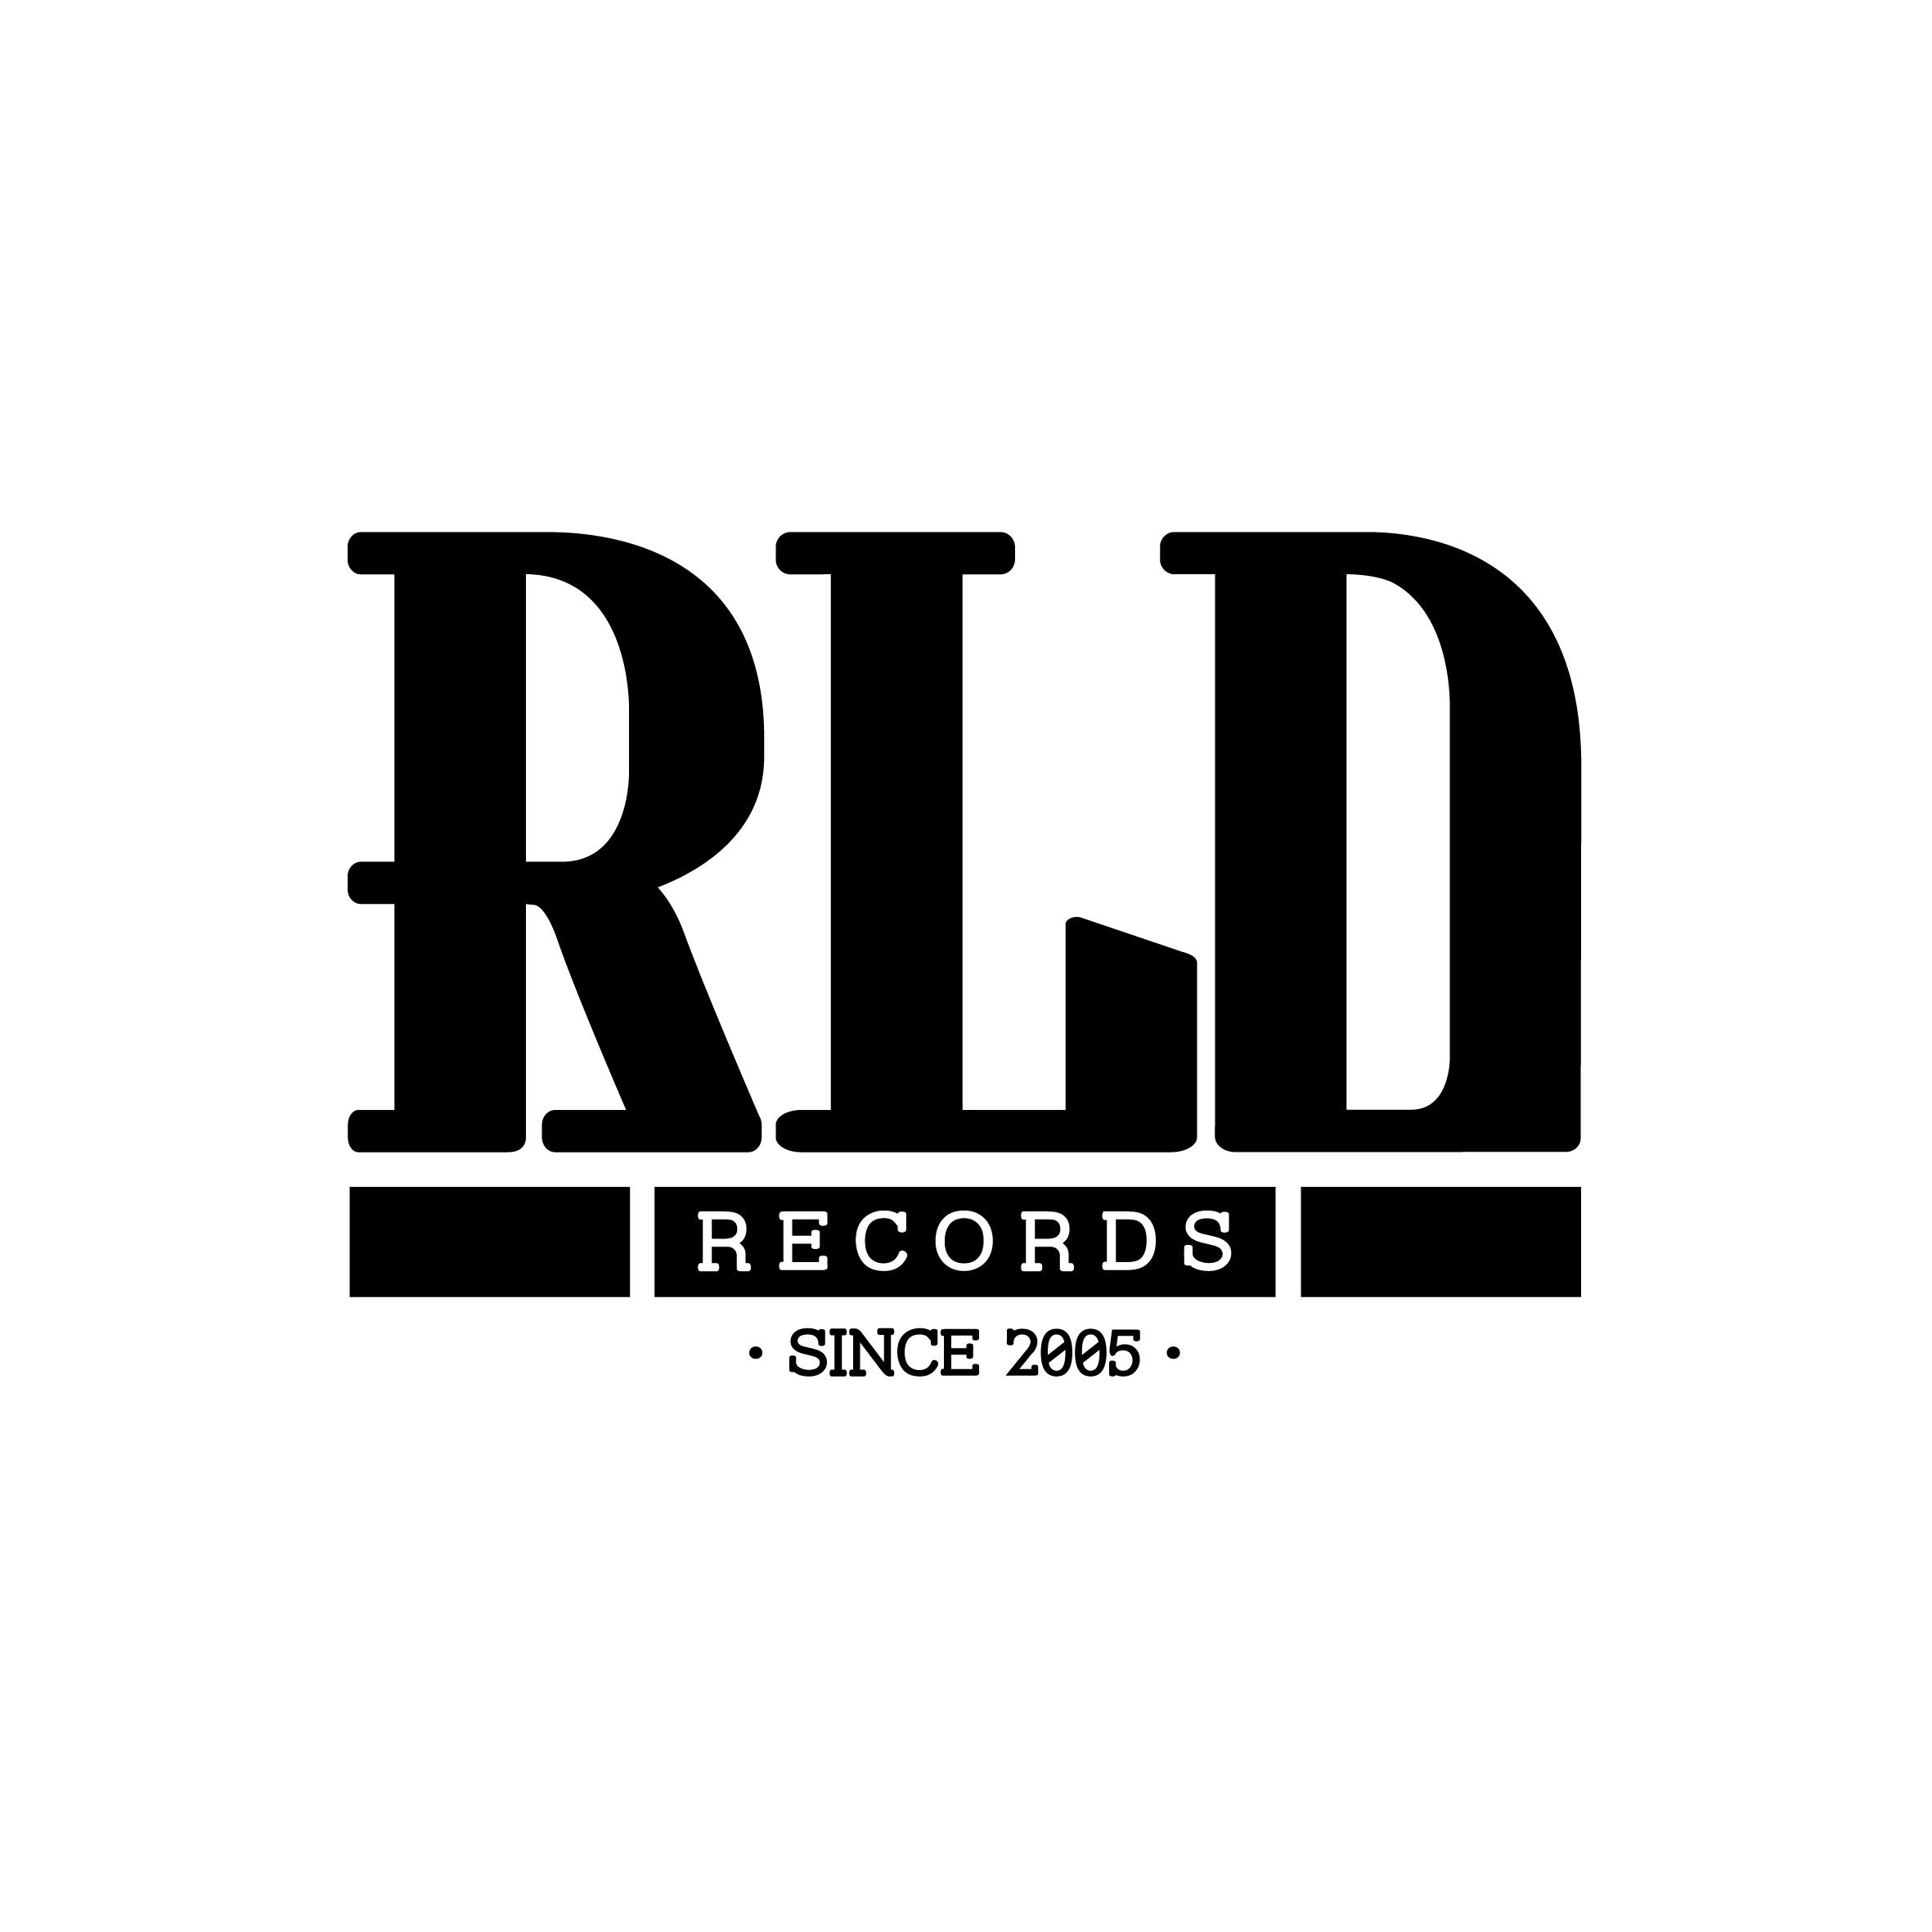 RLD RECORDS - KEEPING HIP HOP ALIVE